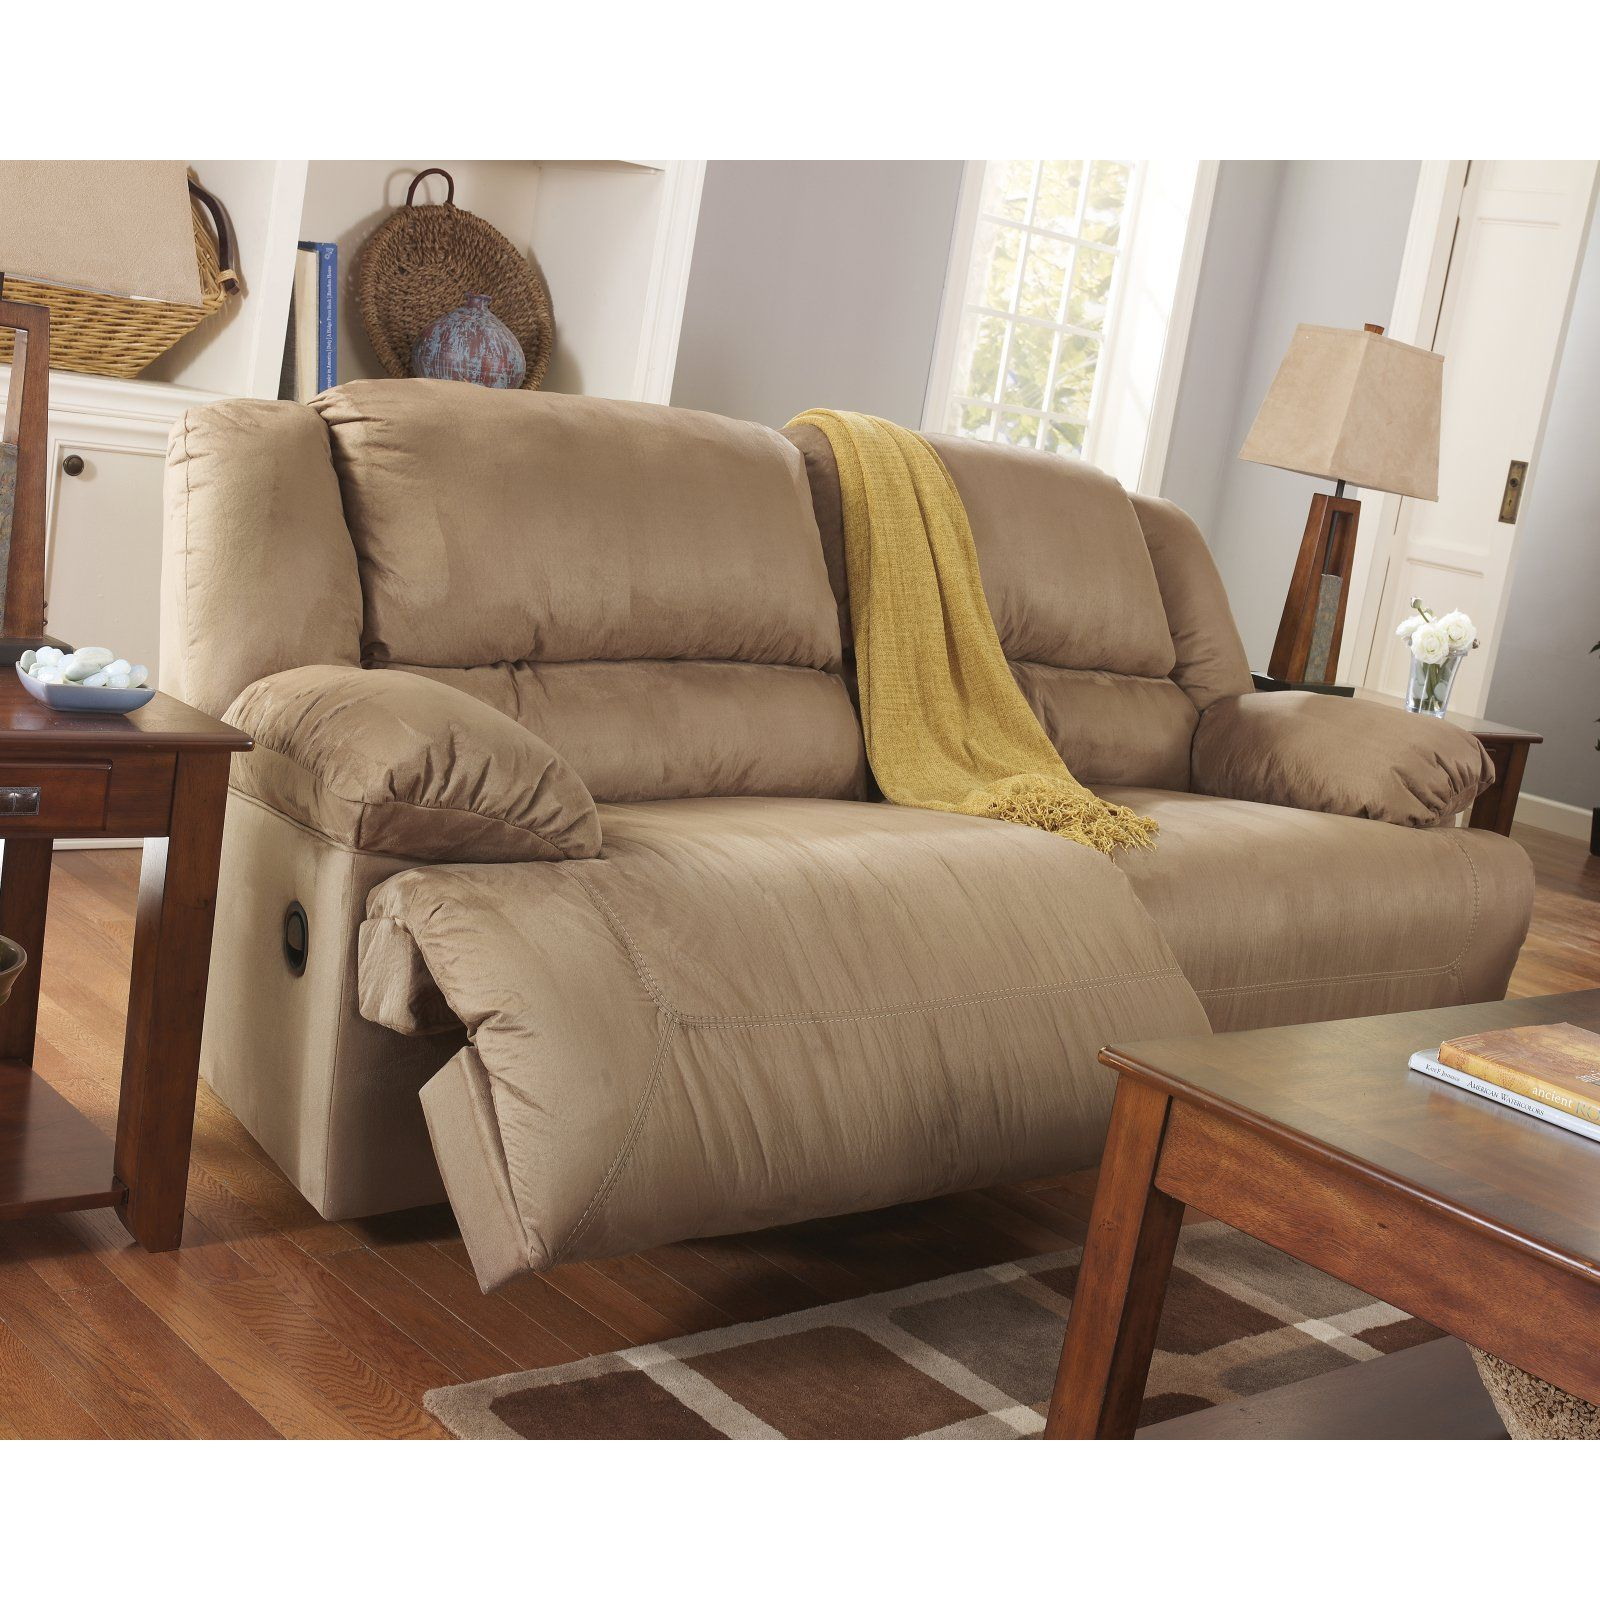 Signature Design By Ashley Hogan Reclining Sofa In 2020 Reclining Sofa Living Room Sofa Ashley Furniture Sofas